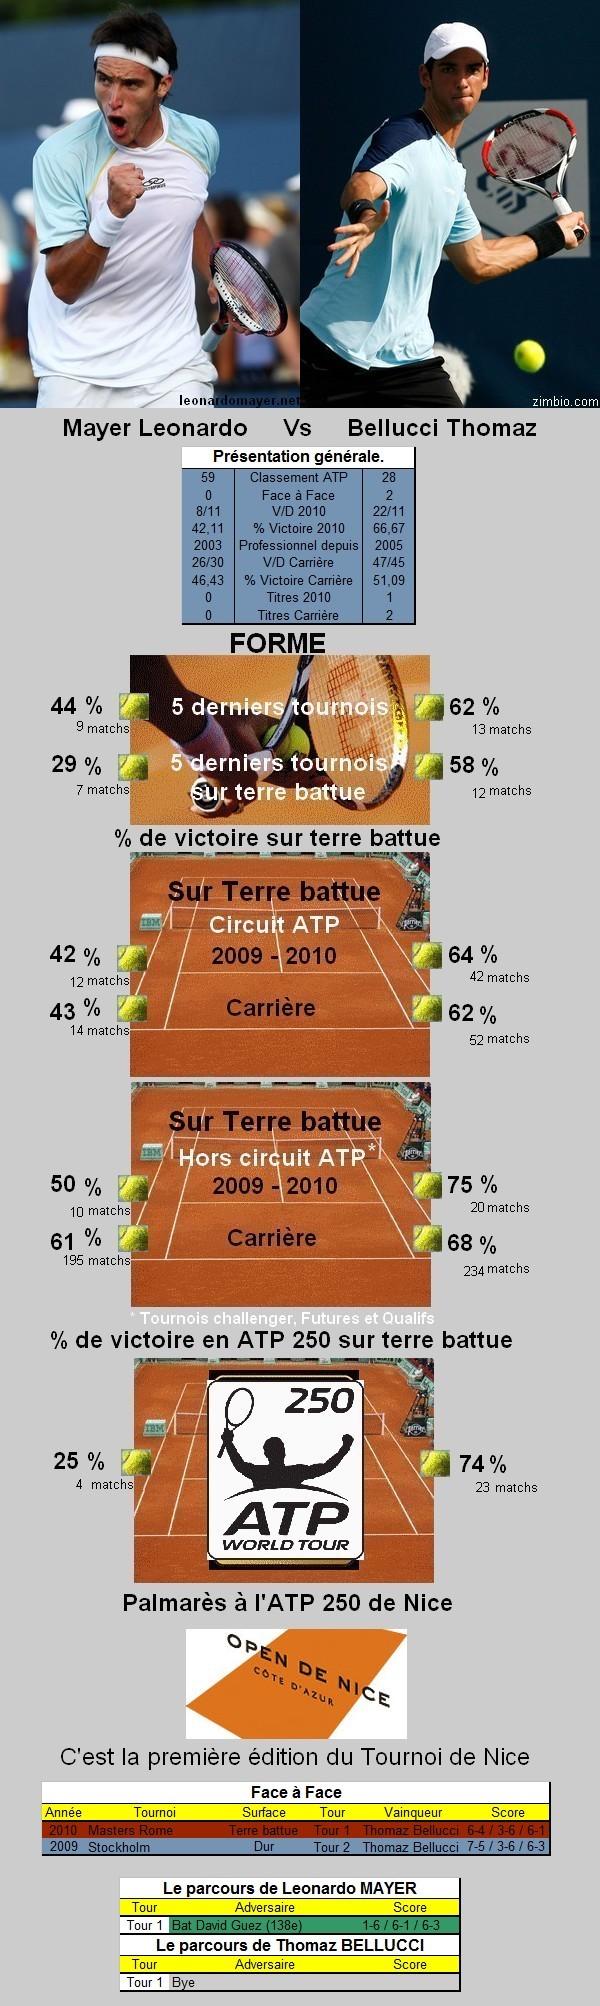 Statistiques tennis de Mayer contre Bellucci à Nice